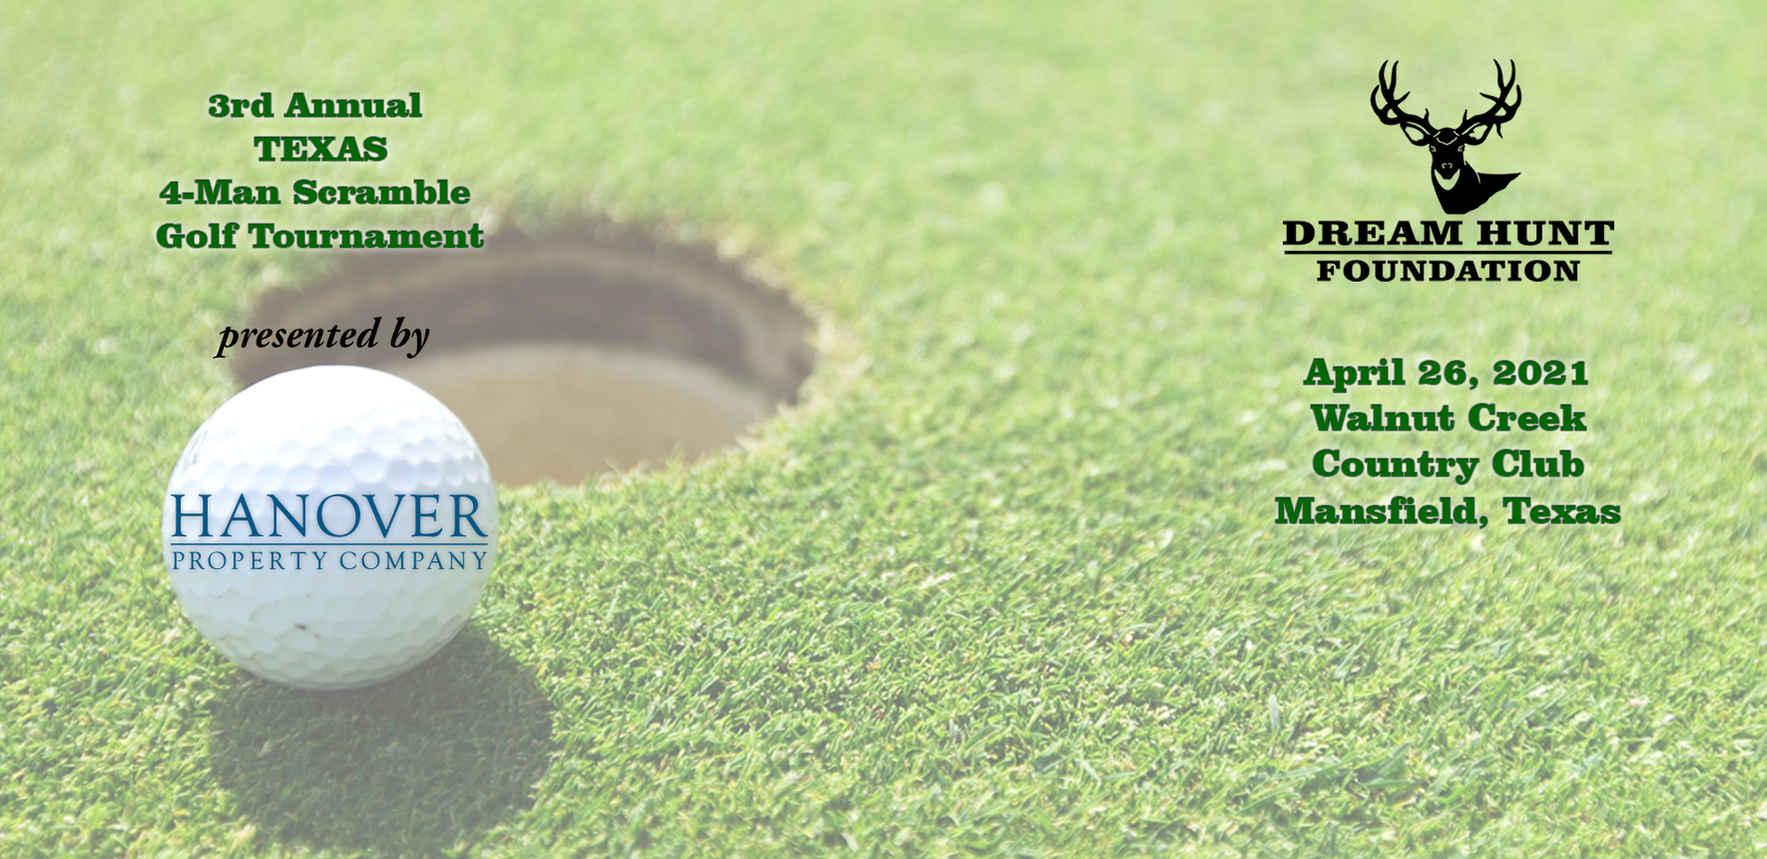 2021 Texas Dream Hunt Golf Tournament image